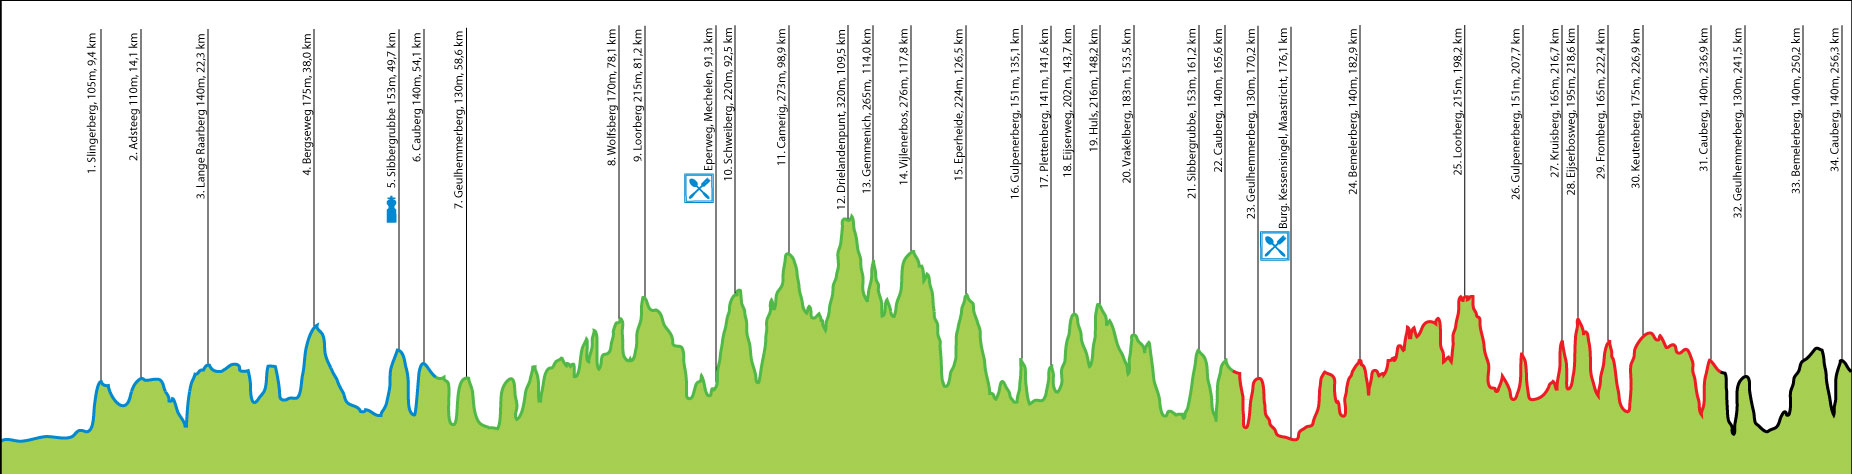 amstel gold race 2015 - profile